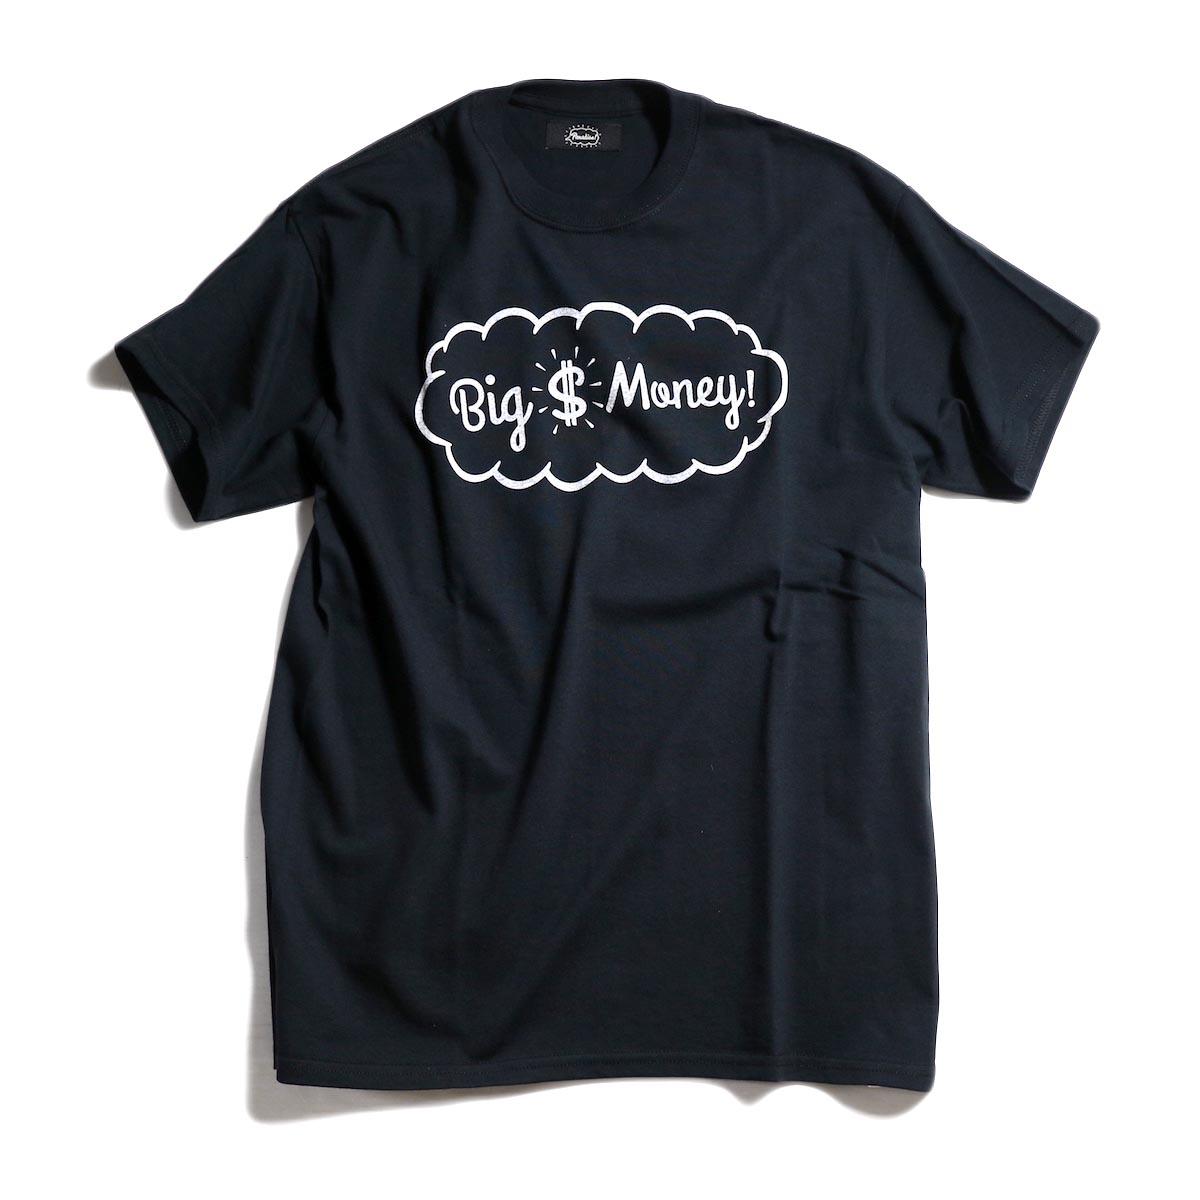 Paradise! / T-Shirt (C'mon) -BlackParadise! / T-Shirt (Big Money) -Black